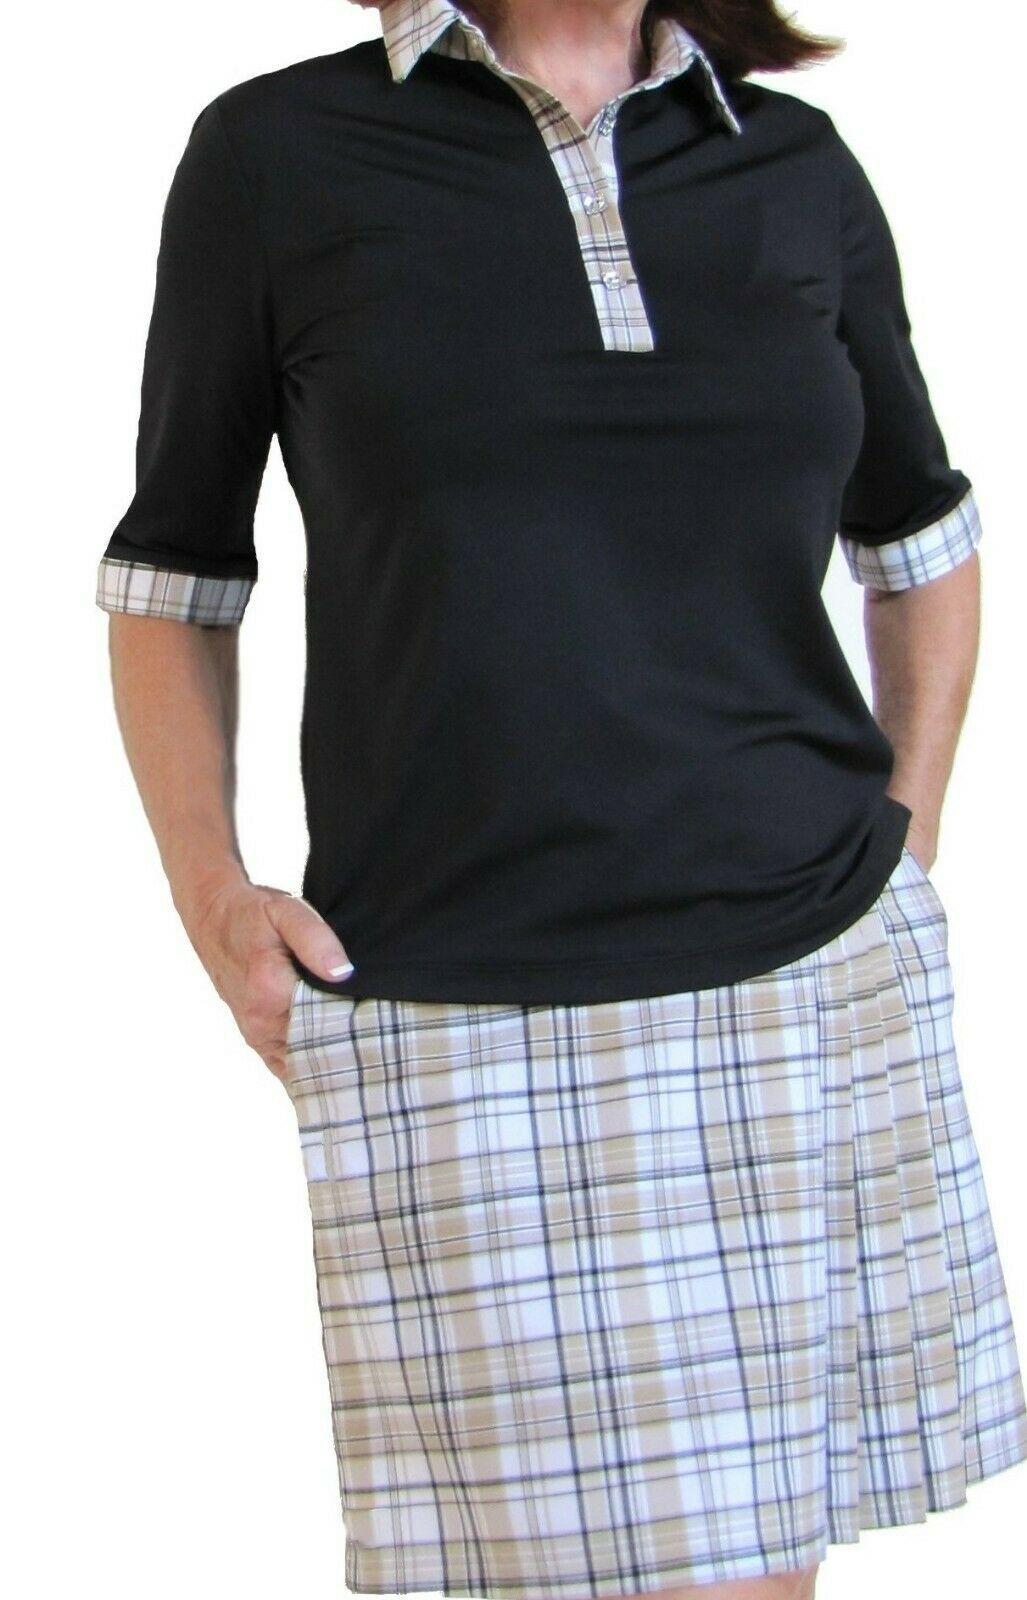 "Women's 26"" Stylish Plaid Golf & Casual Capri - New - GoldenWear image 8"